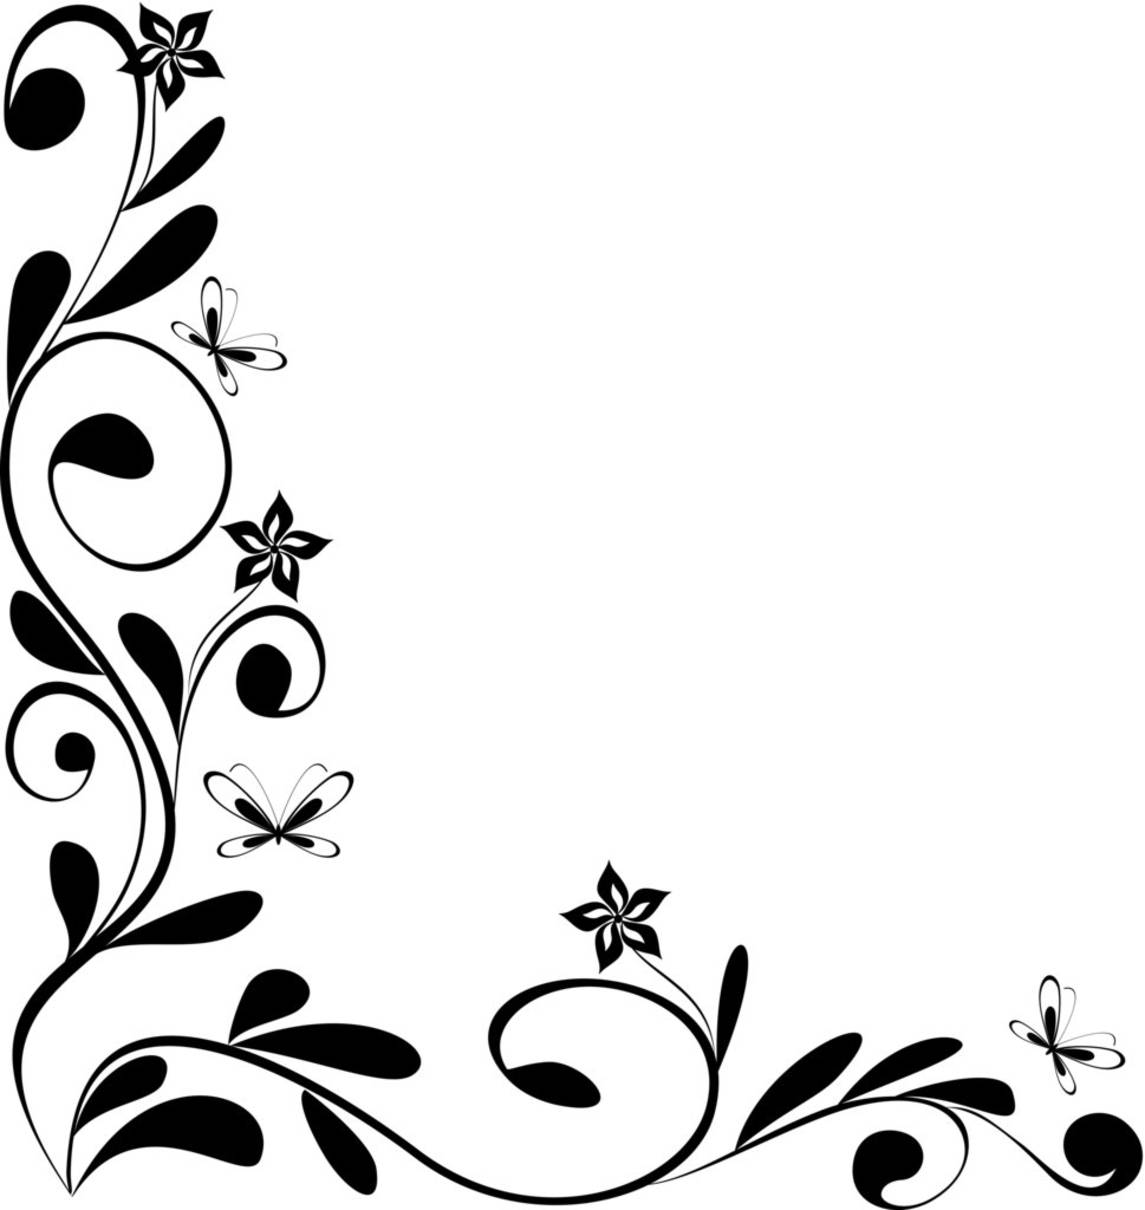 Free Nativity Silhouette Patterns